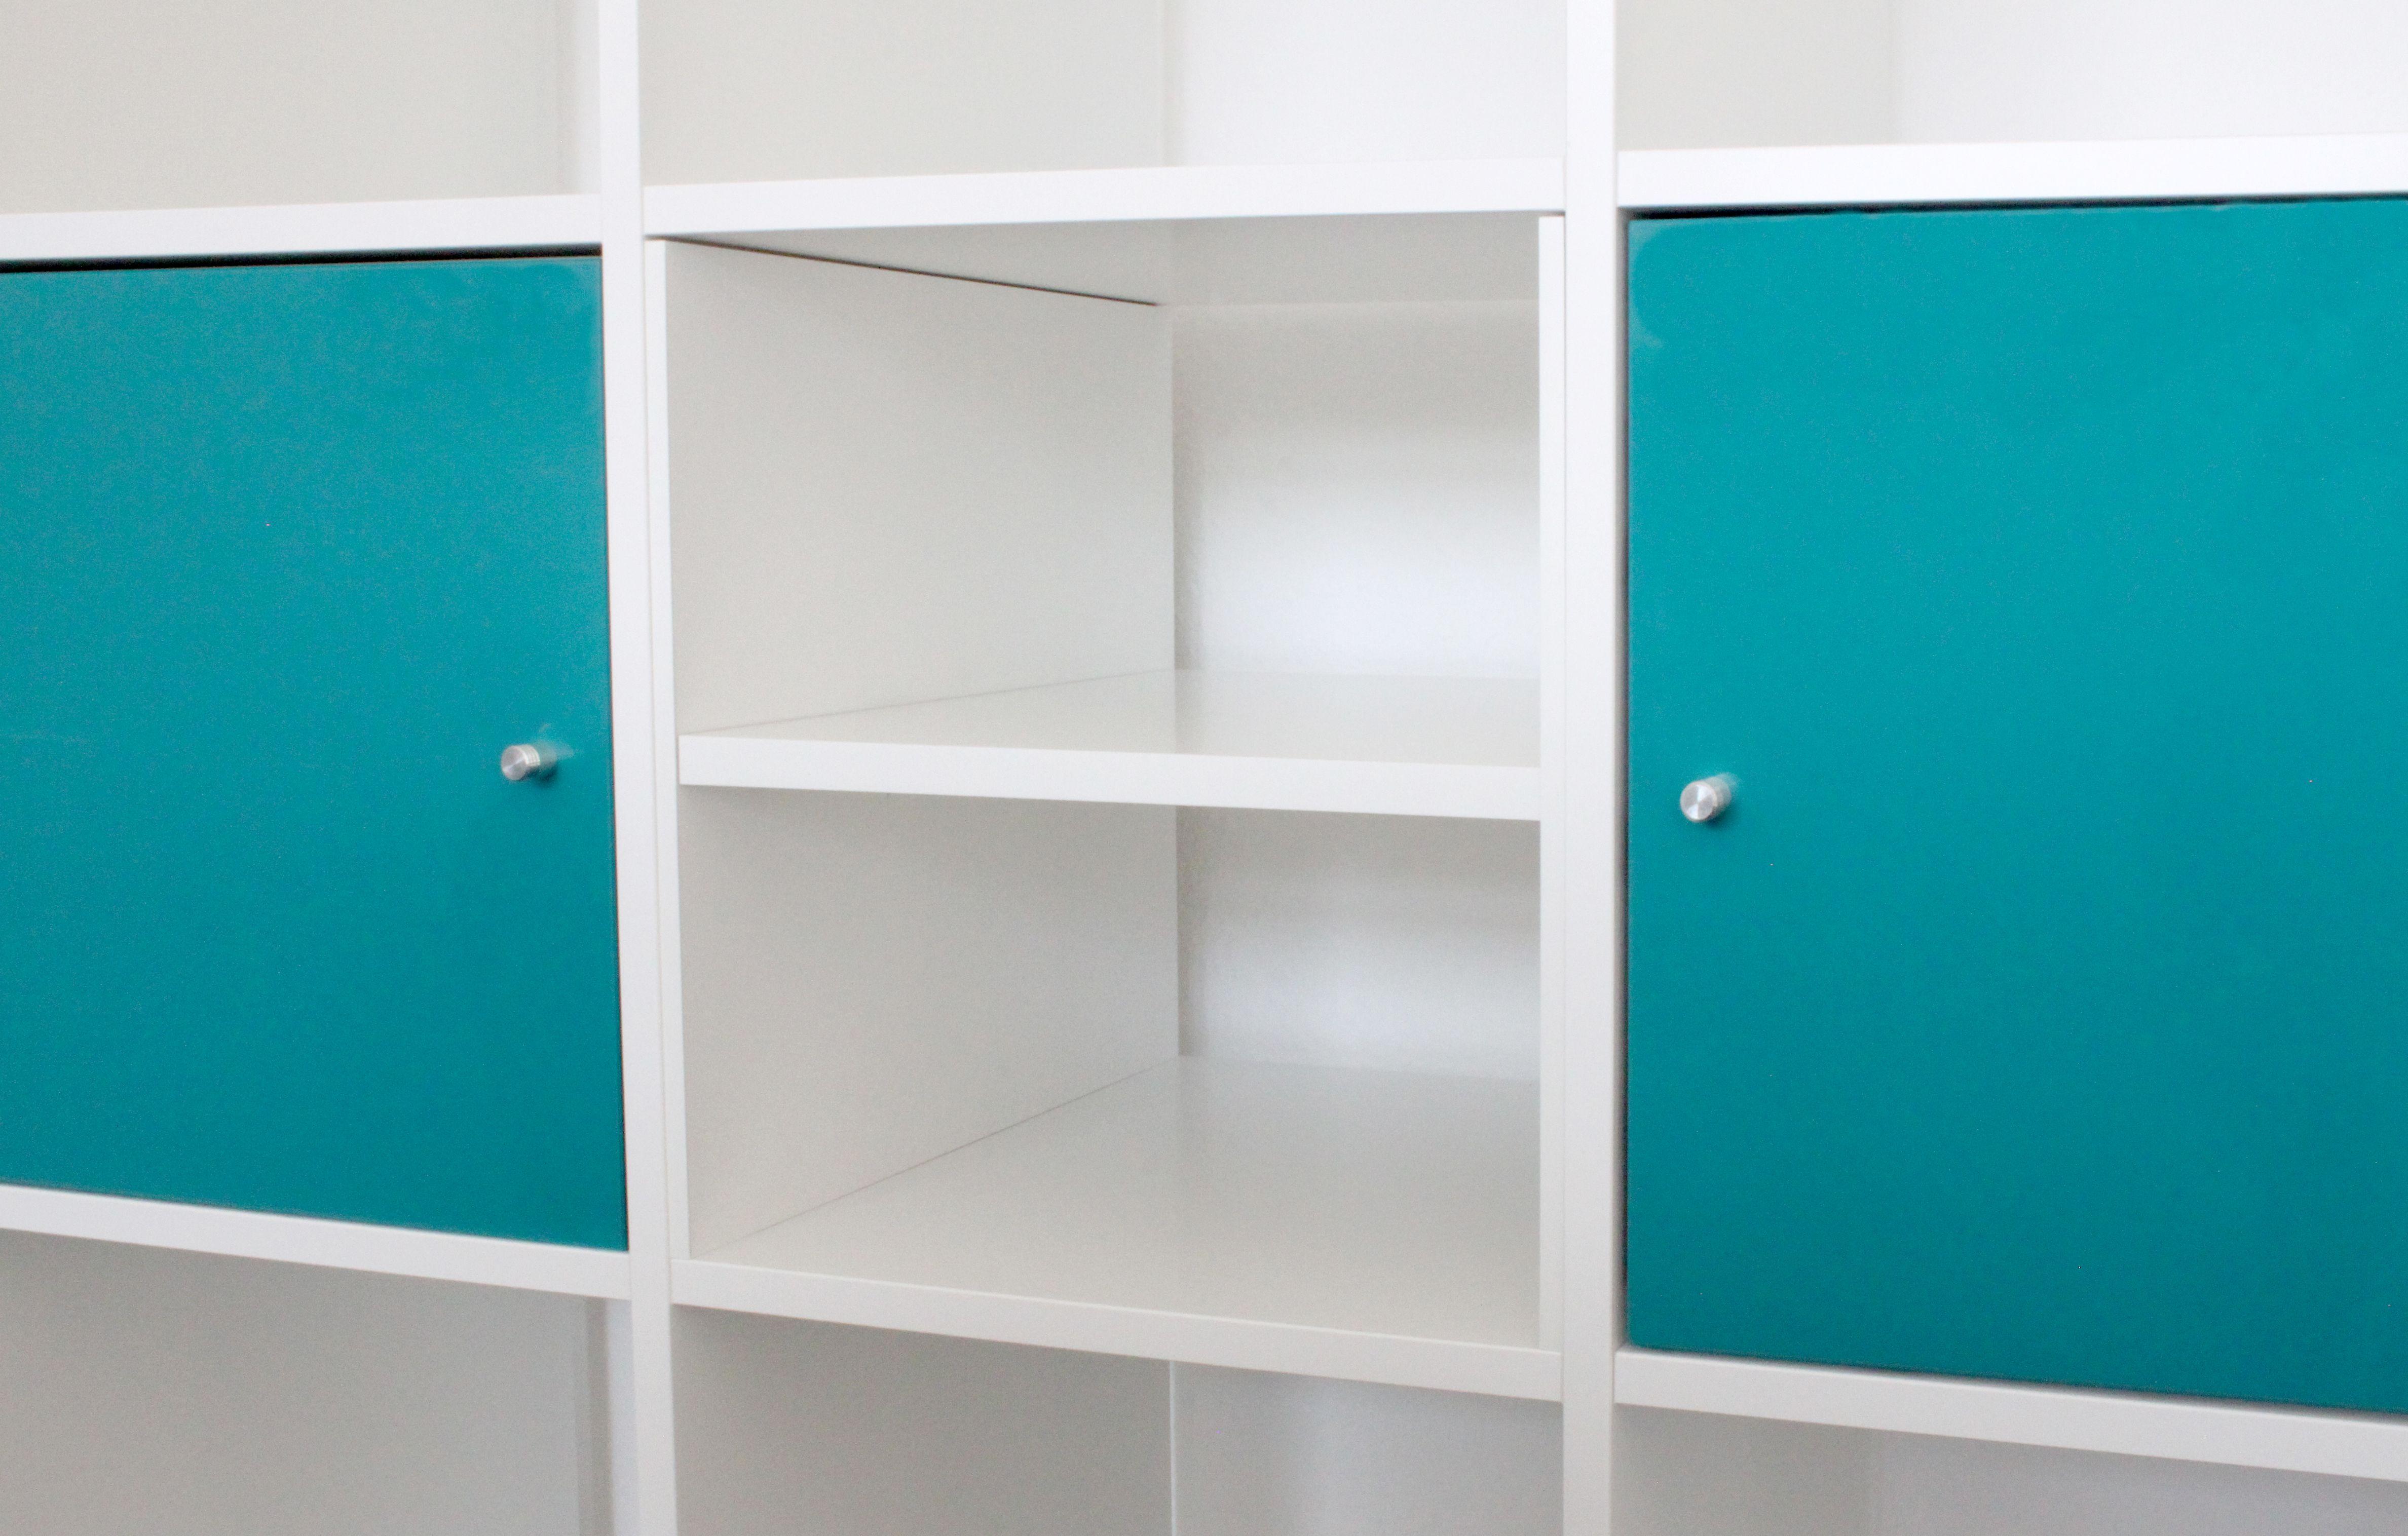 halvera kallax regal pimps pinterest regal m bel und kallax regal. Black Bedroom Furniture Sets. Home Design Ideas